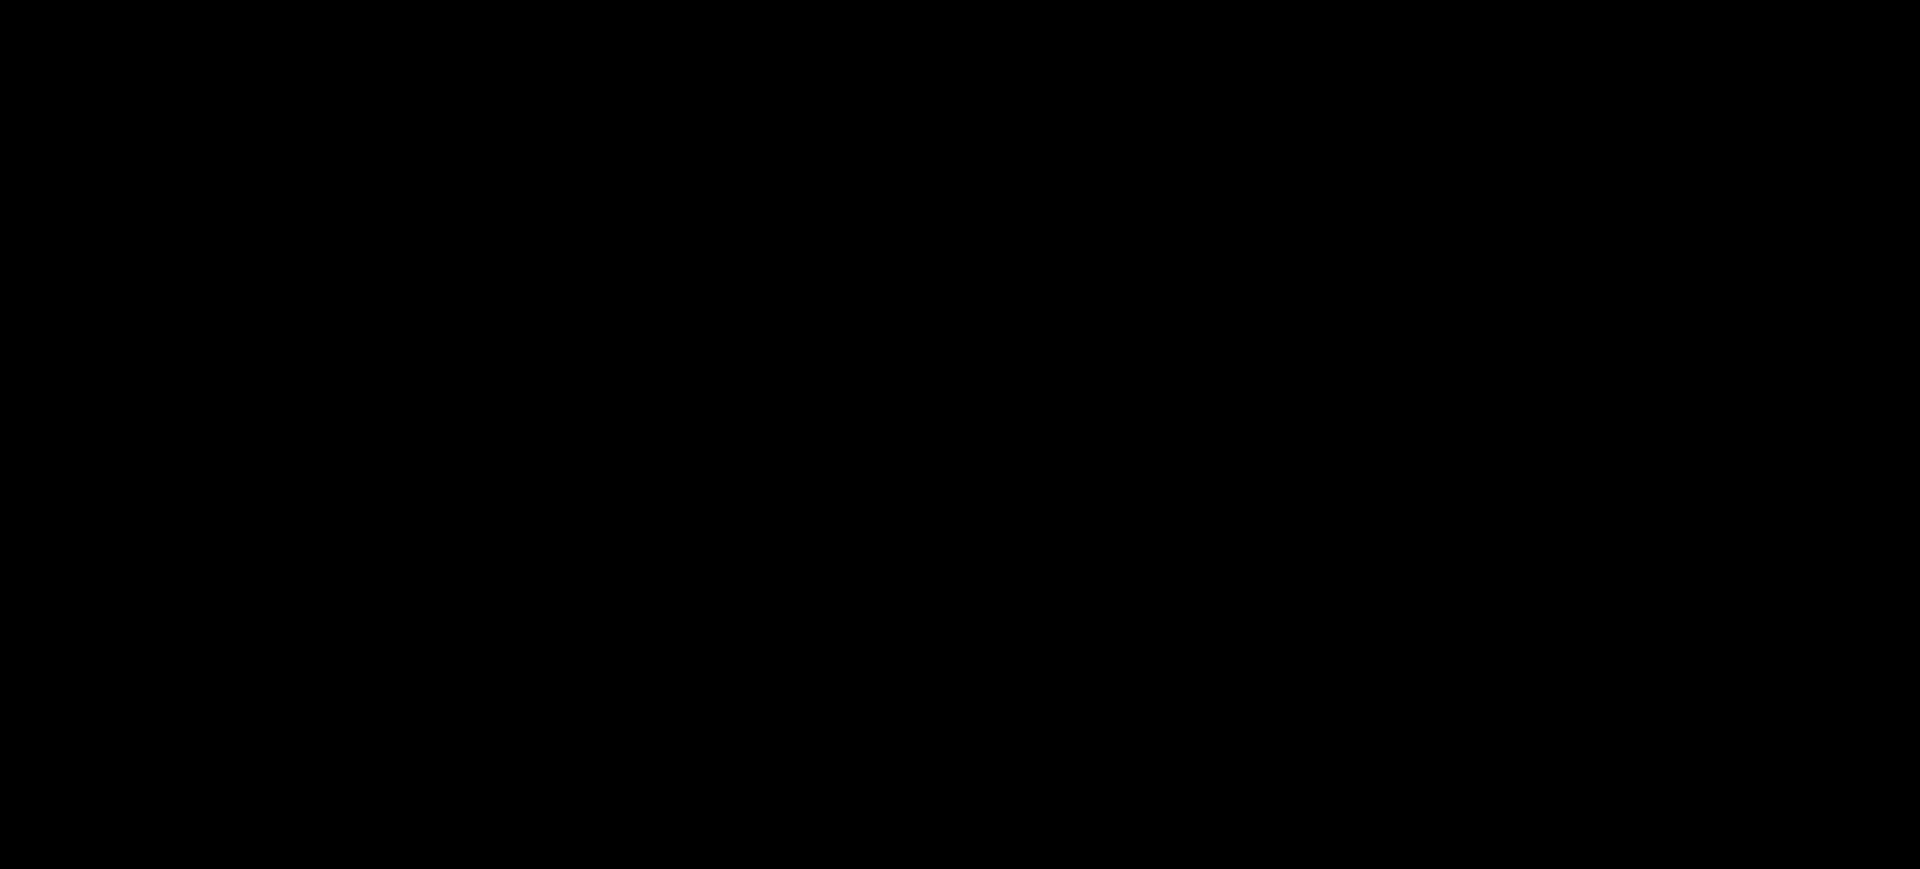 The Jessica Wilkinson, Investor | Realtor®  logo